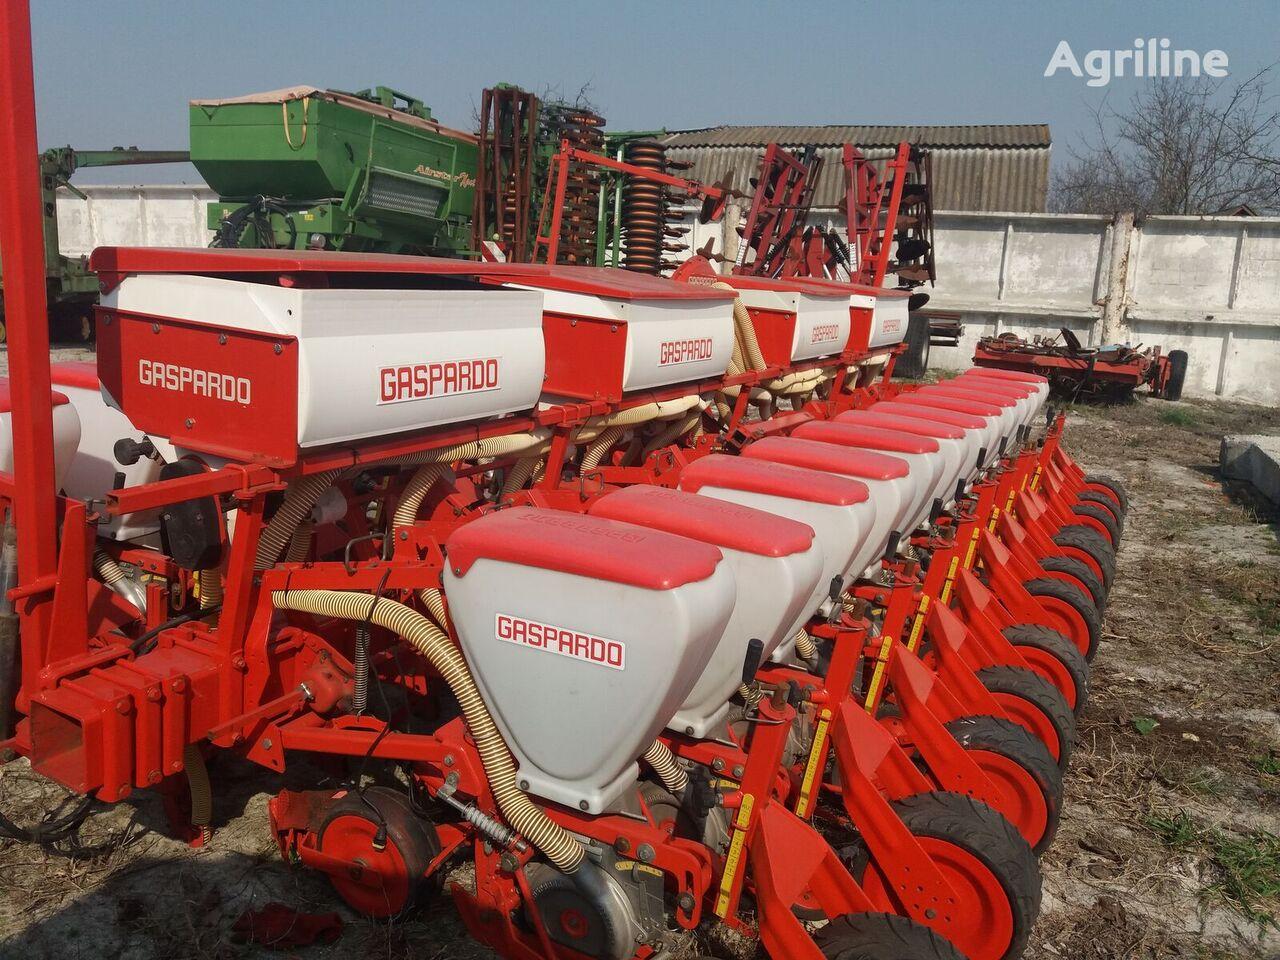 GASPARDO sp 12 pneumatic precision seed drill